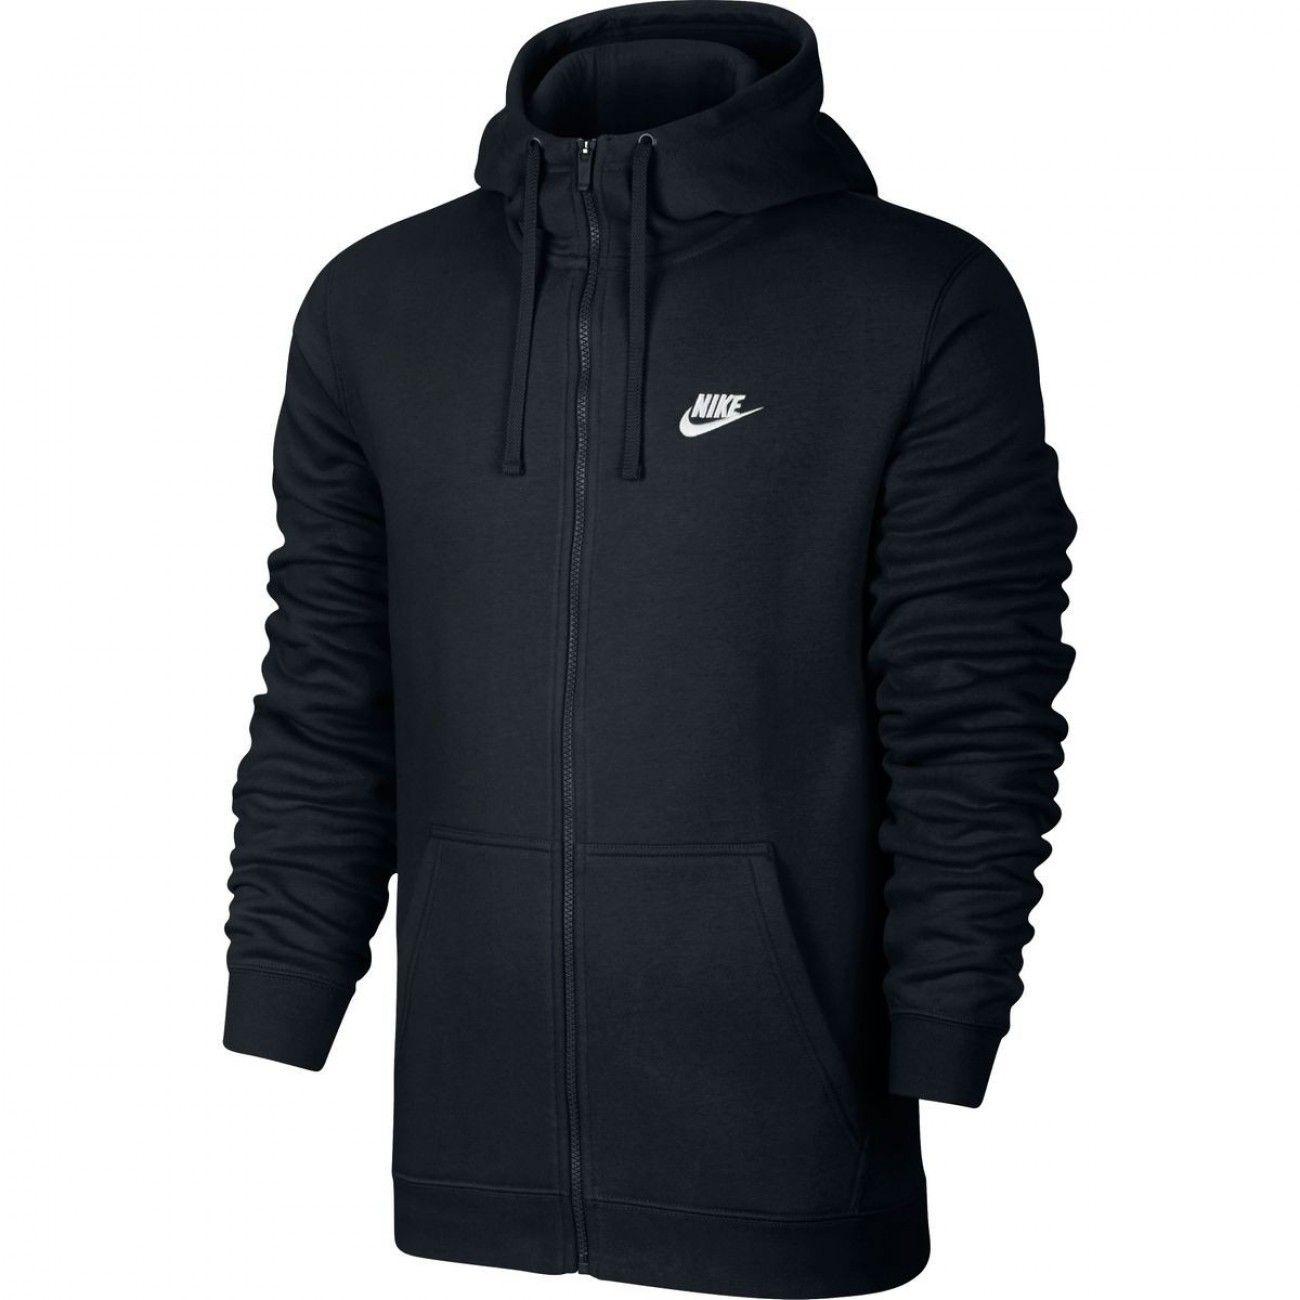 Hiver Nike Nike Nike Nike Manteau Hiver Homme Homme Manteau Manteau Manteau Homme Hiver R4j5LA